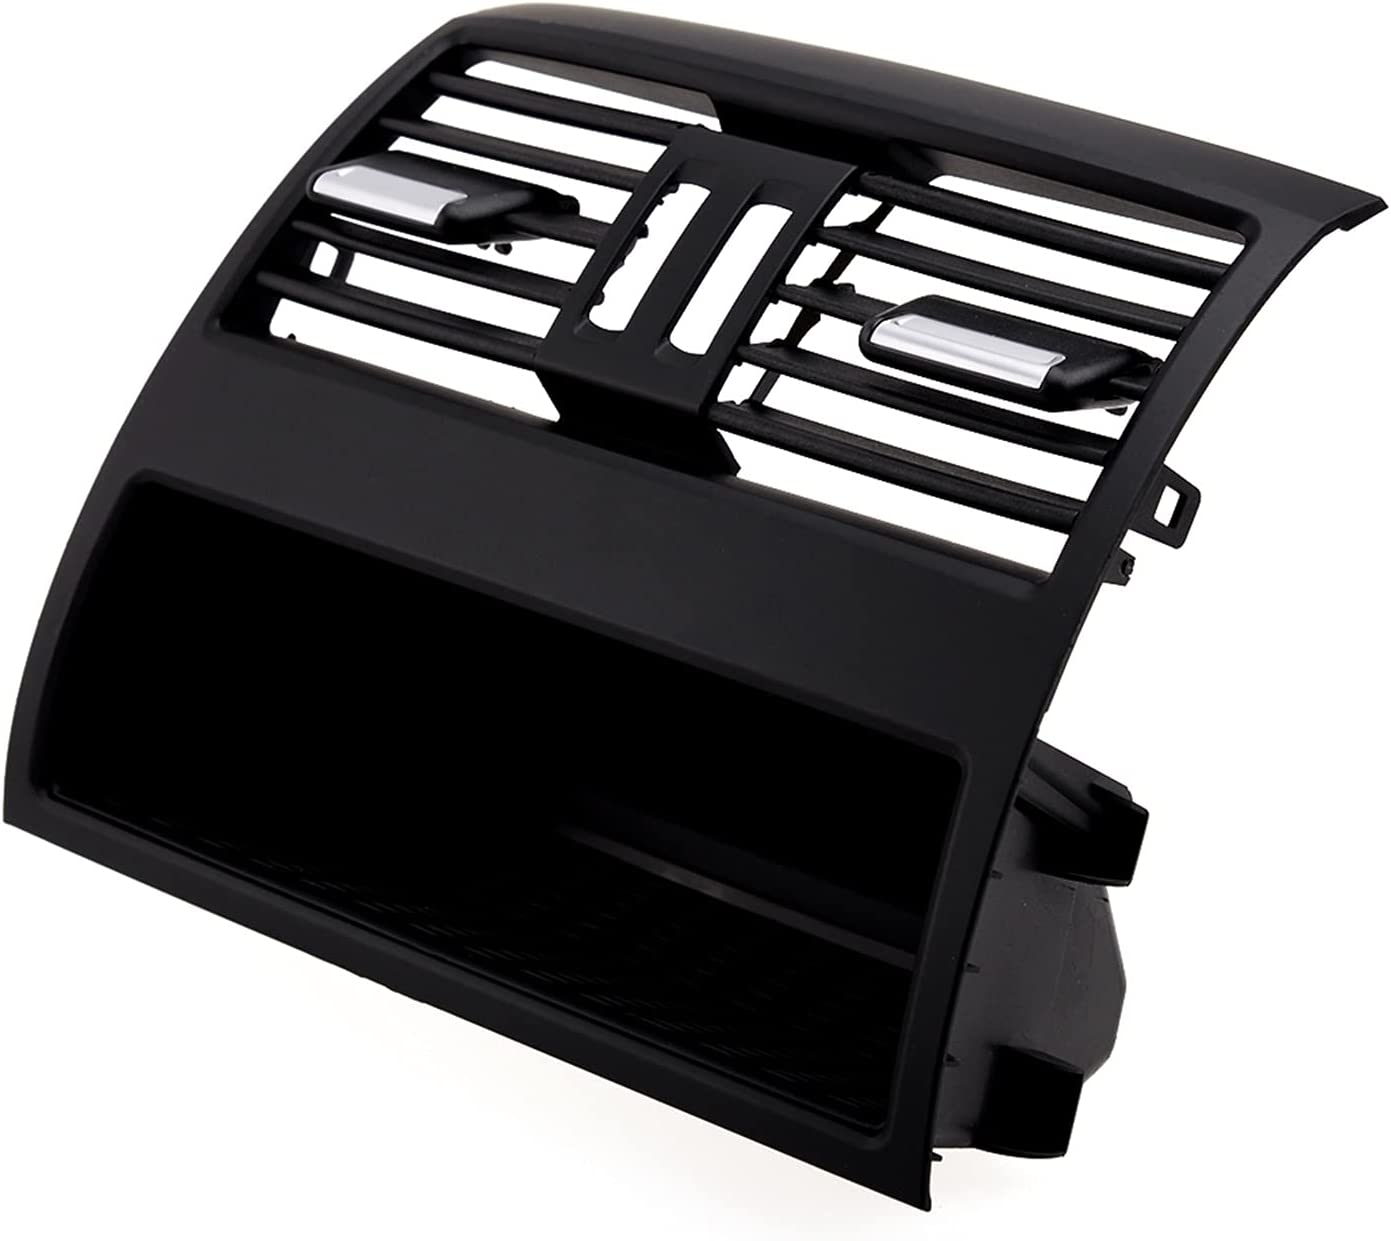 MeiZi Consola de Centro Trasero Consola de ventilación de Aire Fresco Grille A/C Cubierta de Panel Moldeo Fit para BMW 5 Series F10 F11 F18 520i 520D 64229172167